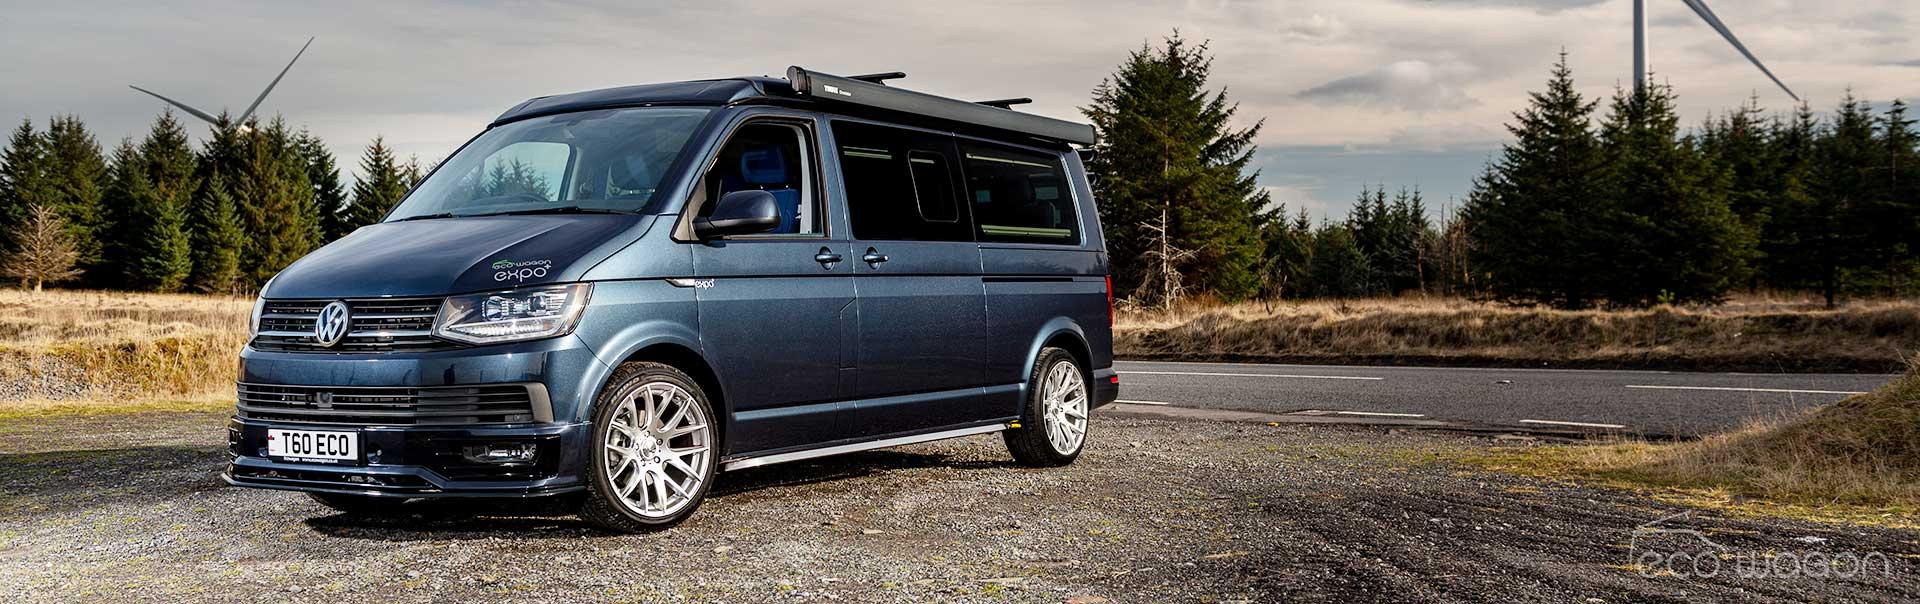 Custom VW T6 Specialists UK